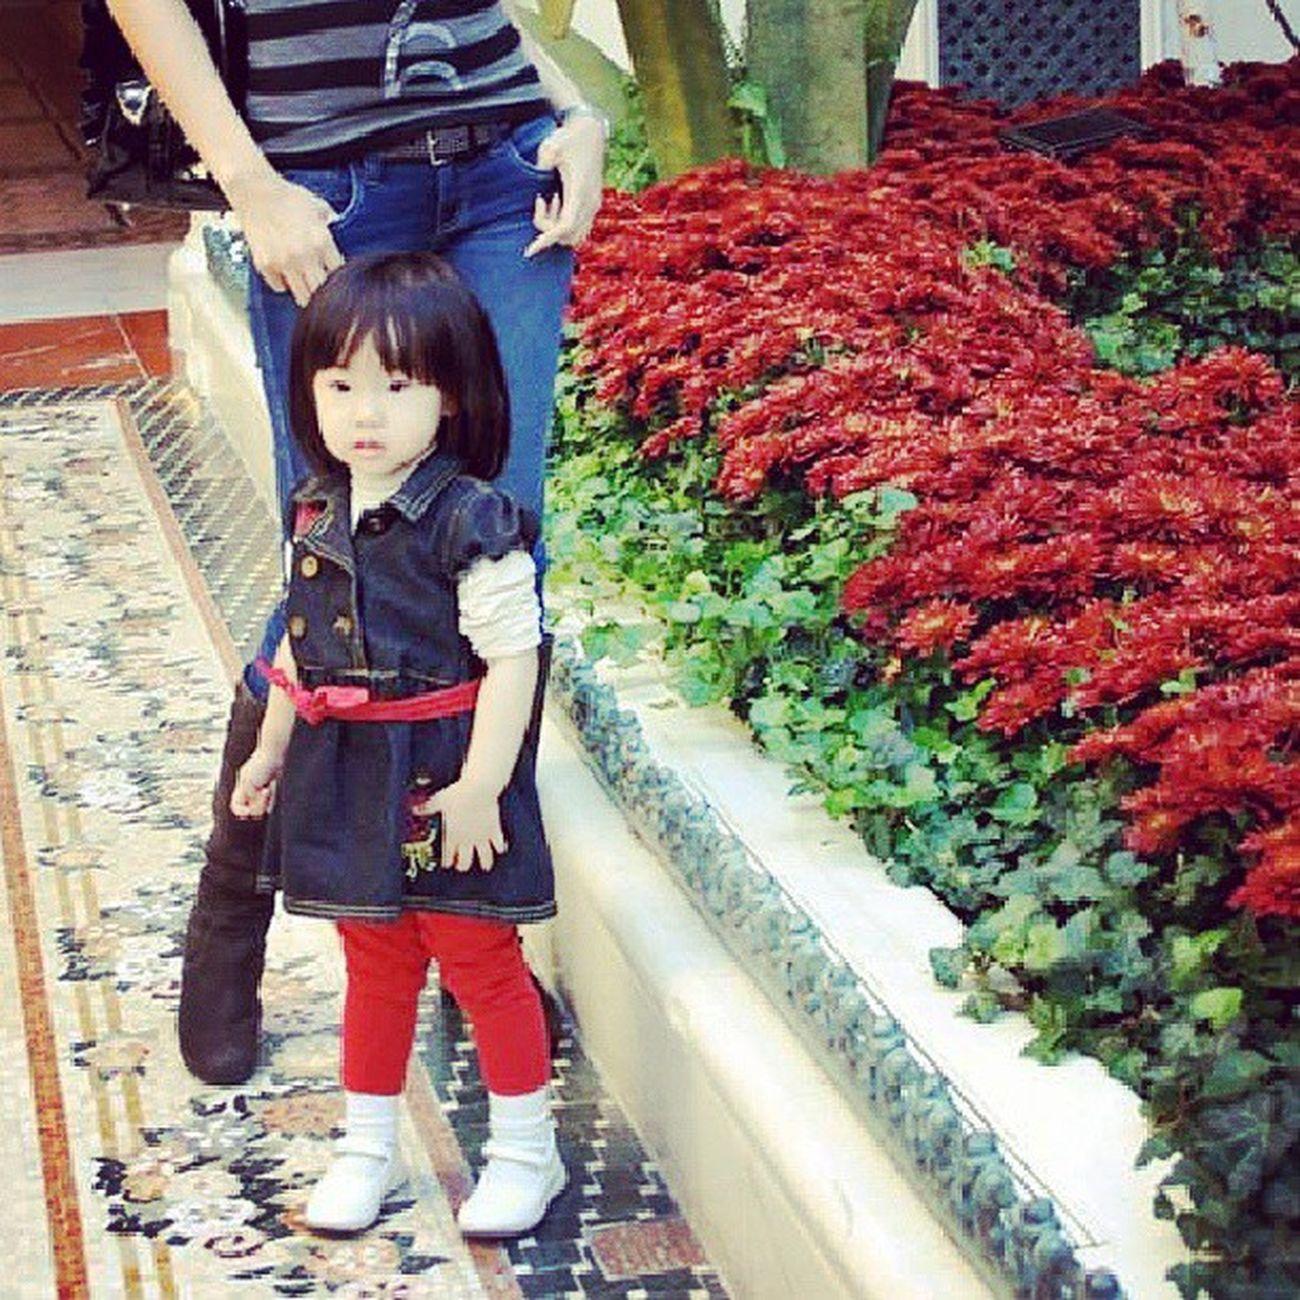 ♥♡♥♡ TBT  TwoByAll SushiCute IAmViet Bellagio garden vegas LasVegas sophia nhi